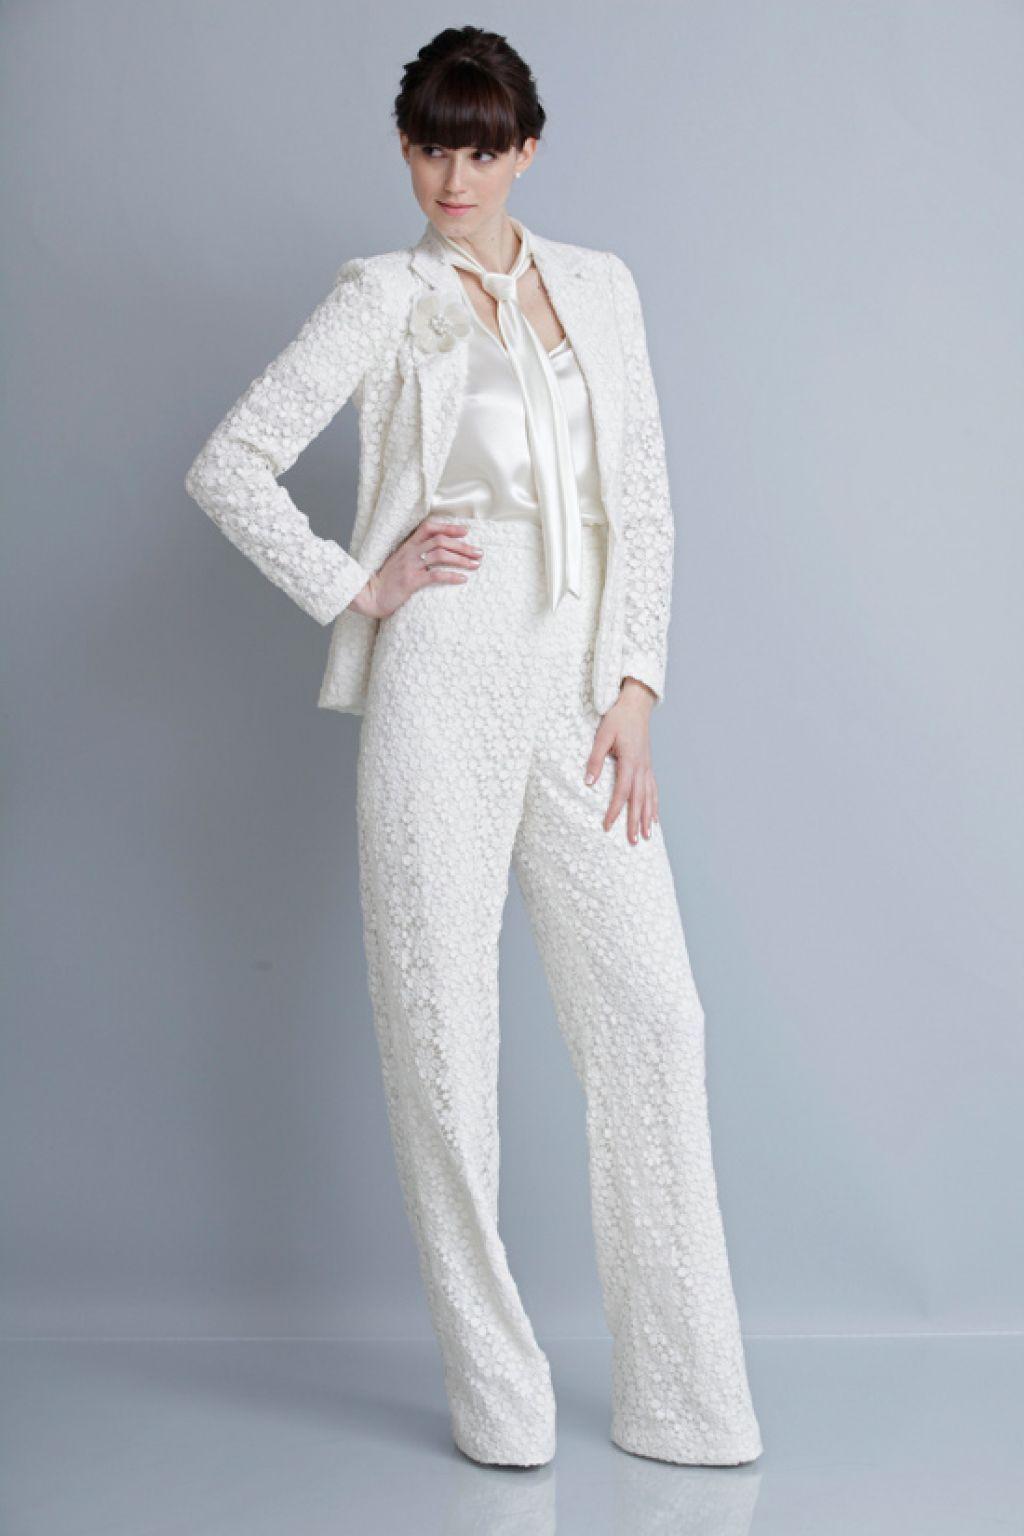 Theia Spring 2013 Bridal Pant Suit | My wedding | Pinterest | Spring ...